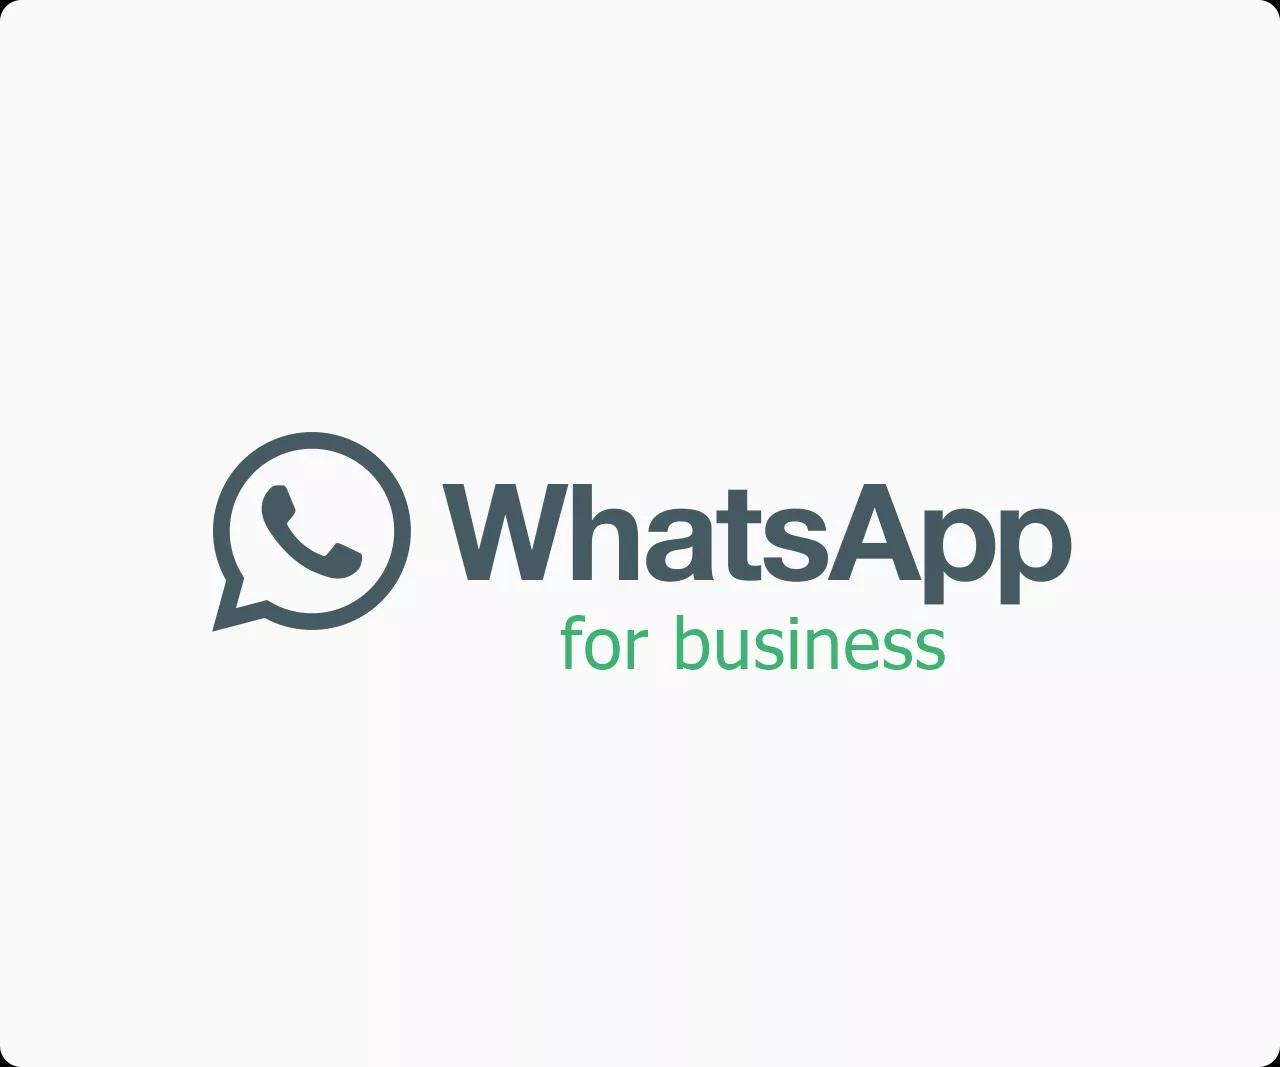 whatsapp business app logo